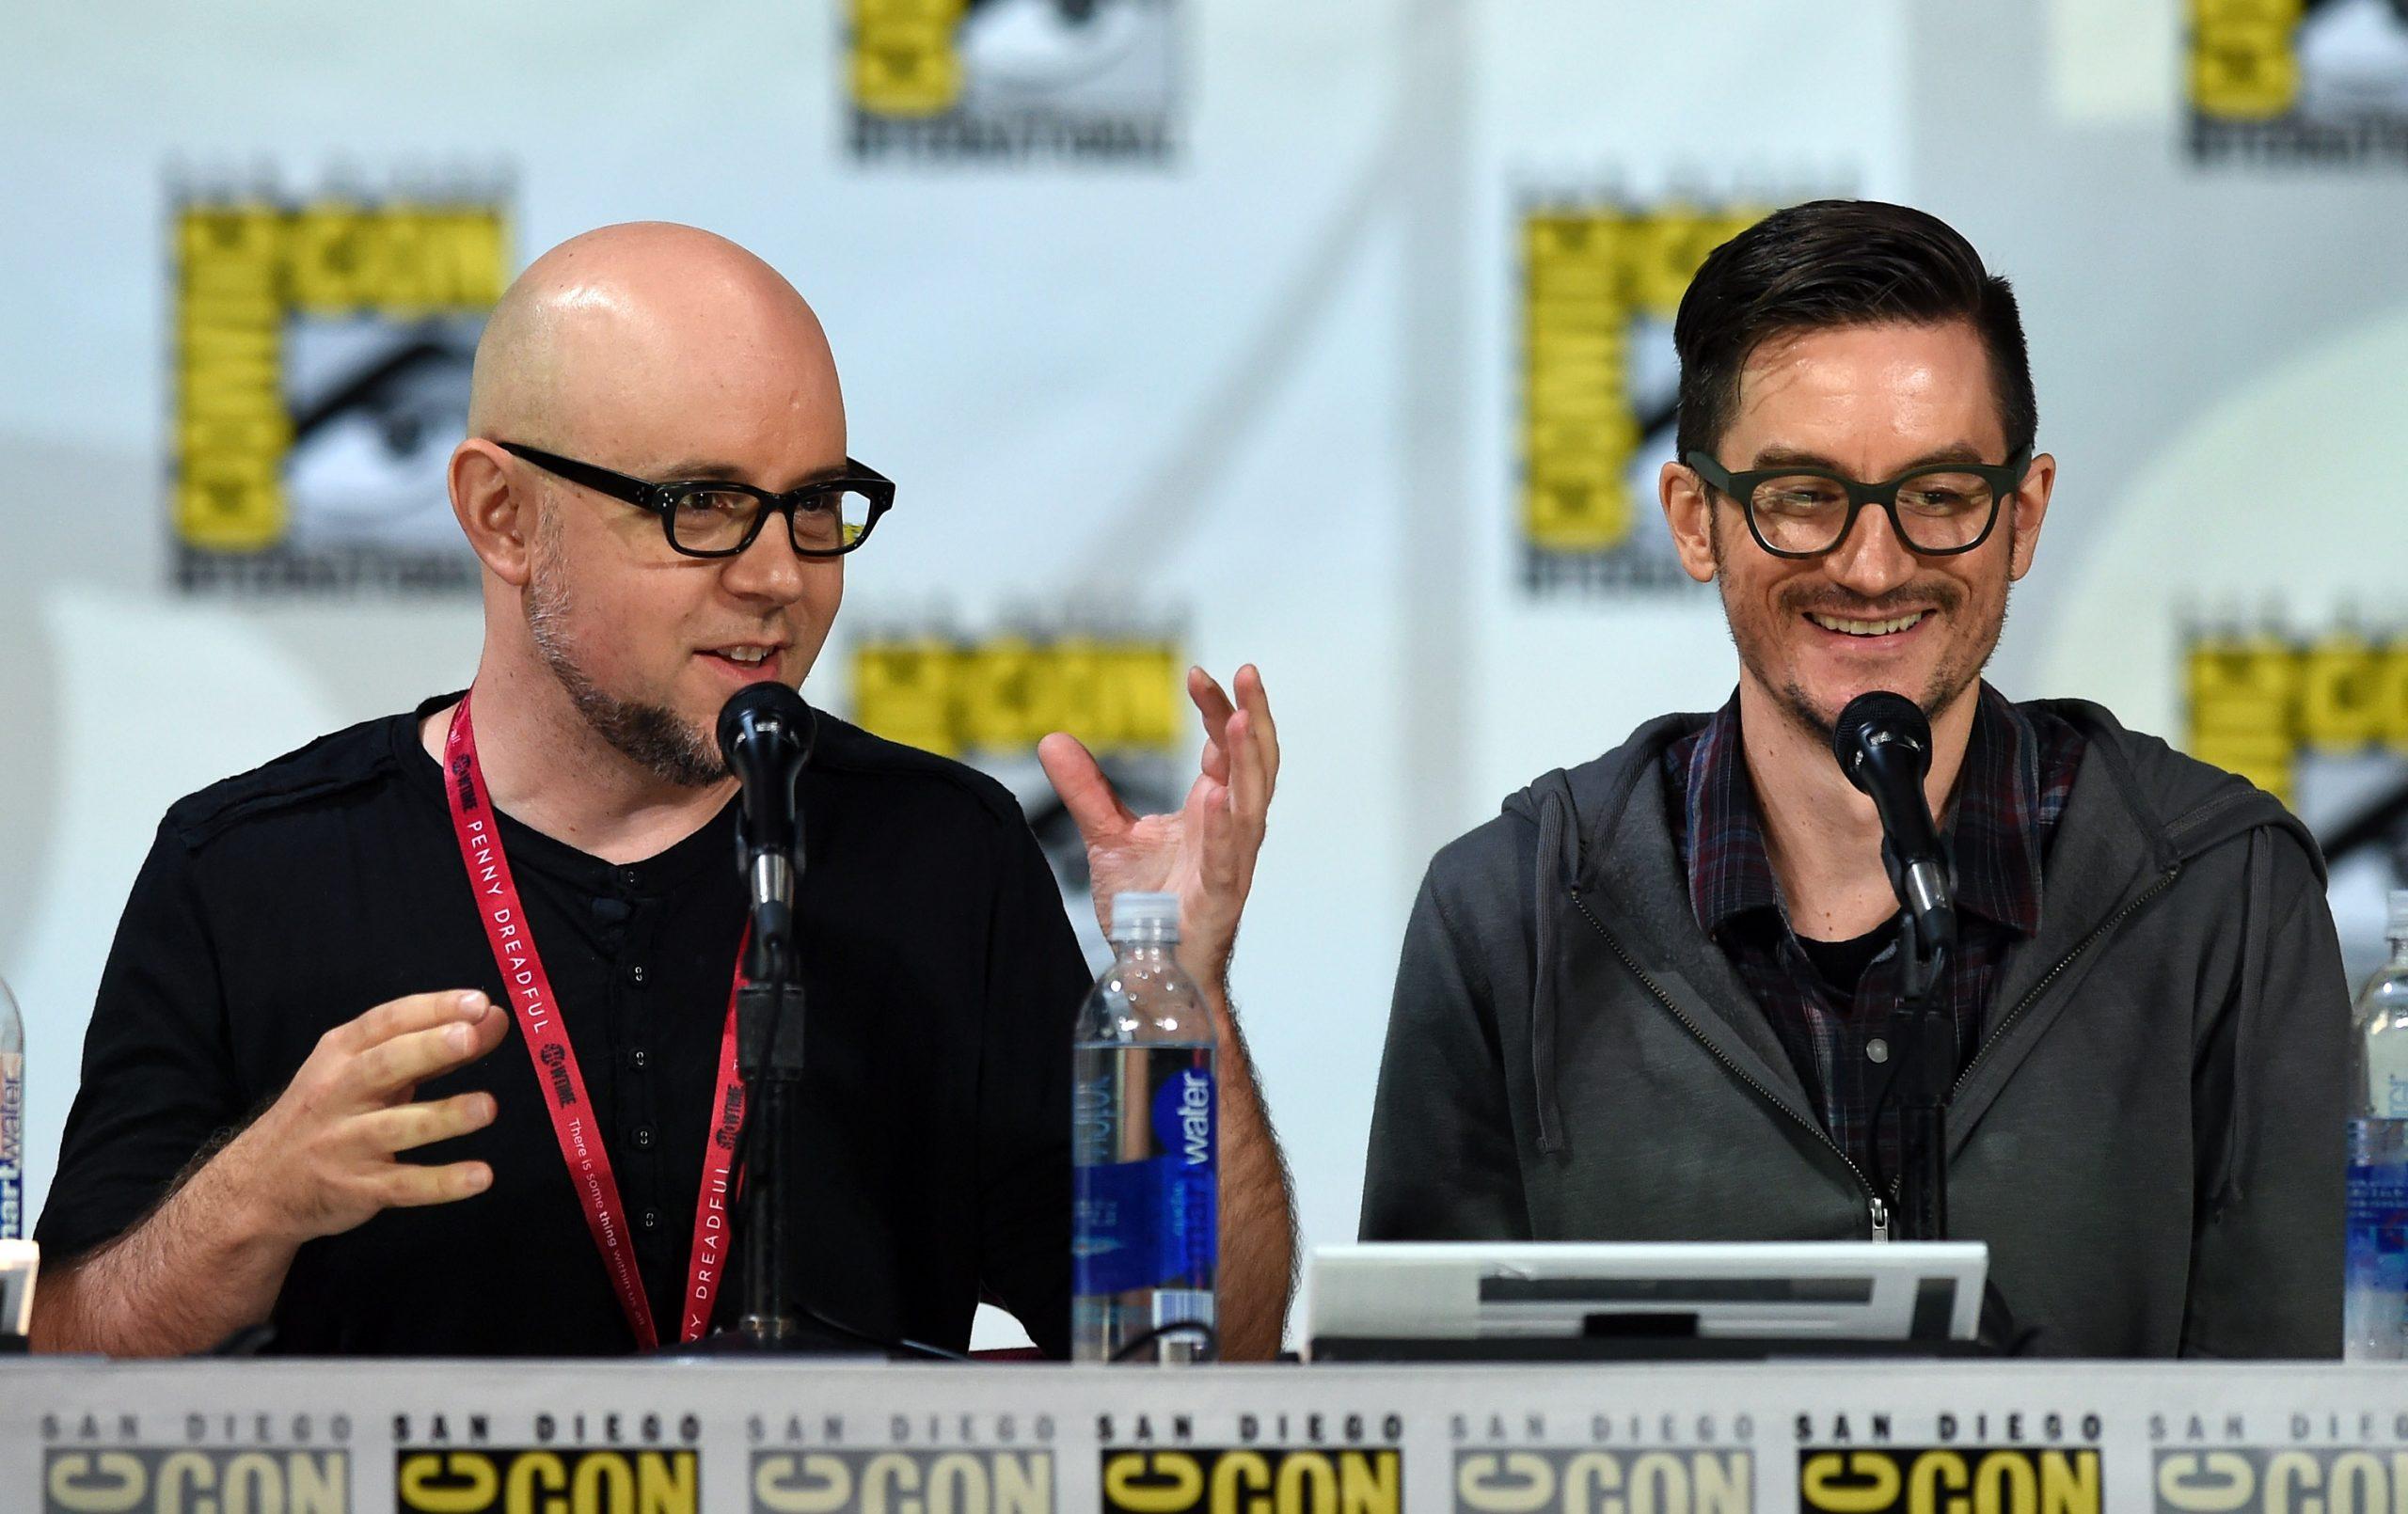 Writer/director Michael Dante DiMartino (L) and writer/producer Bryan Konietzko created Avatar: The Last Airbender